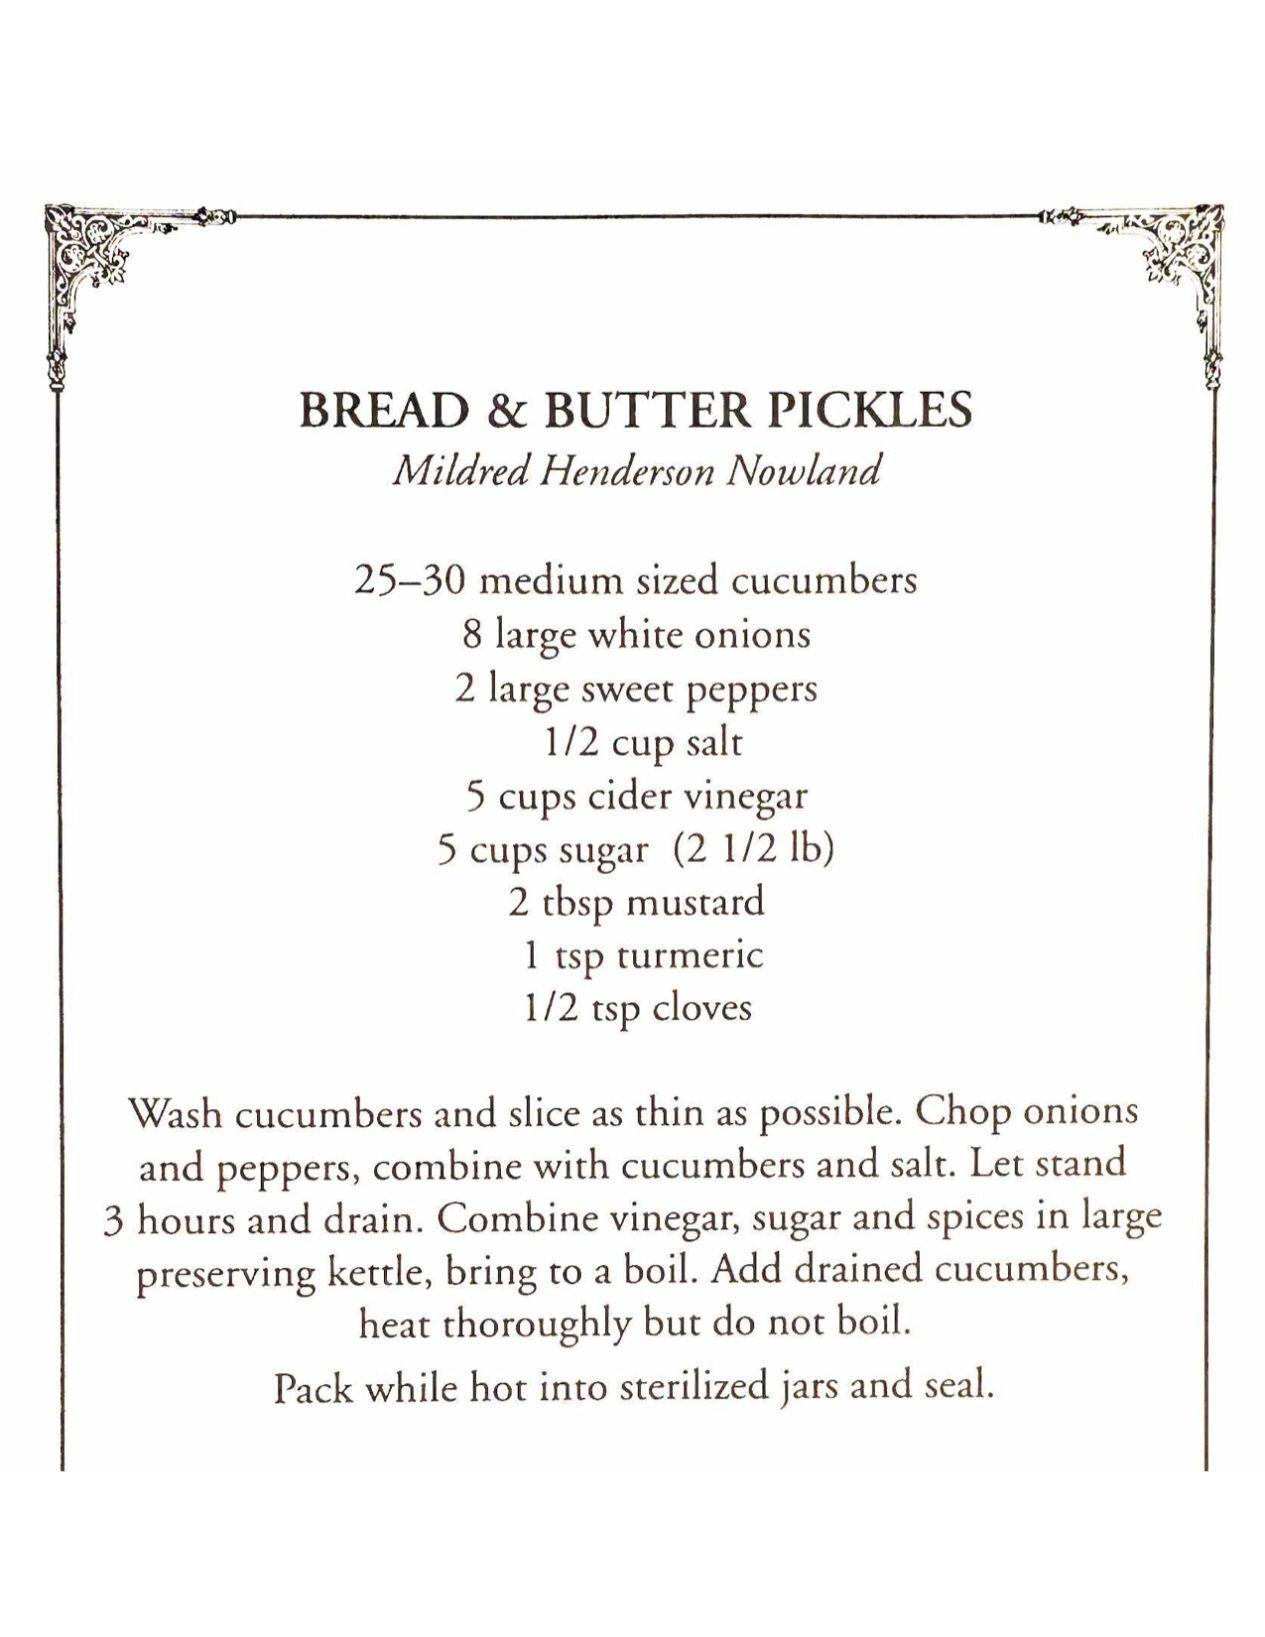 Mildred's Pickle Recipe